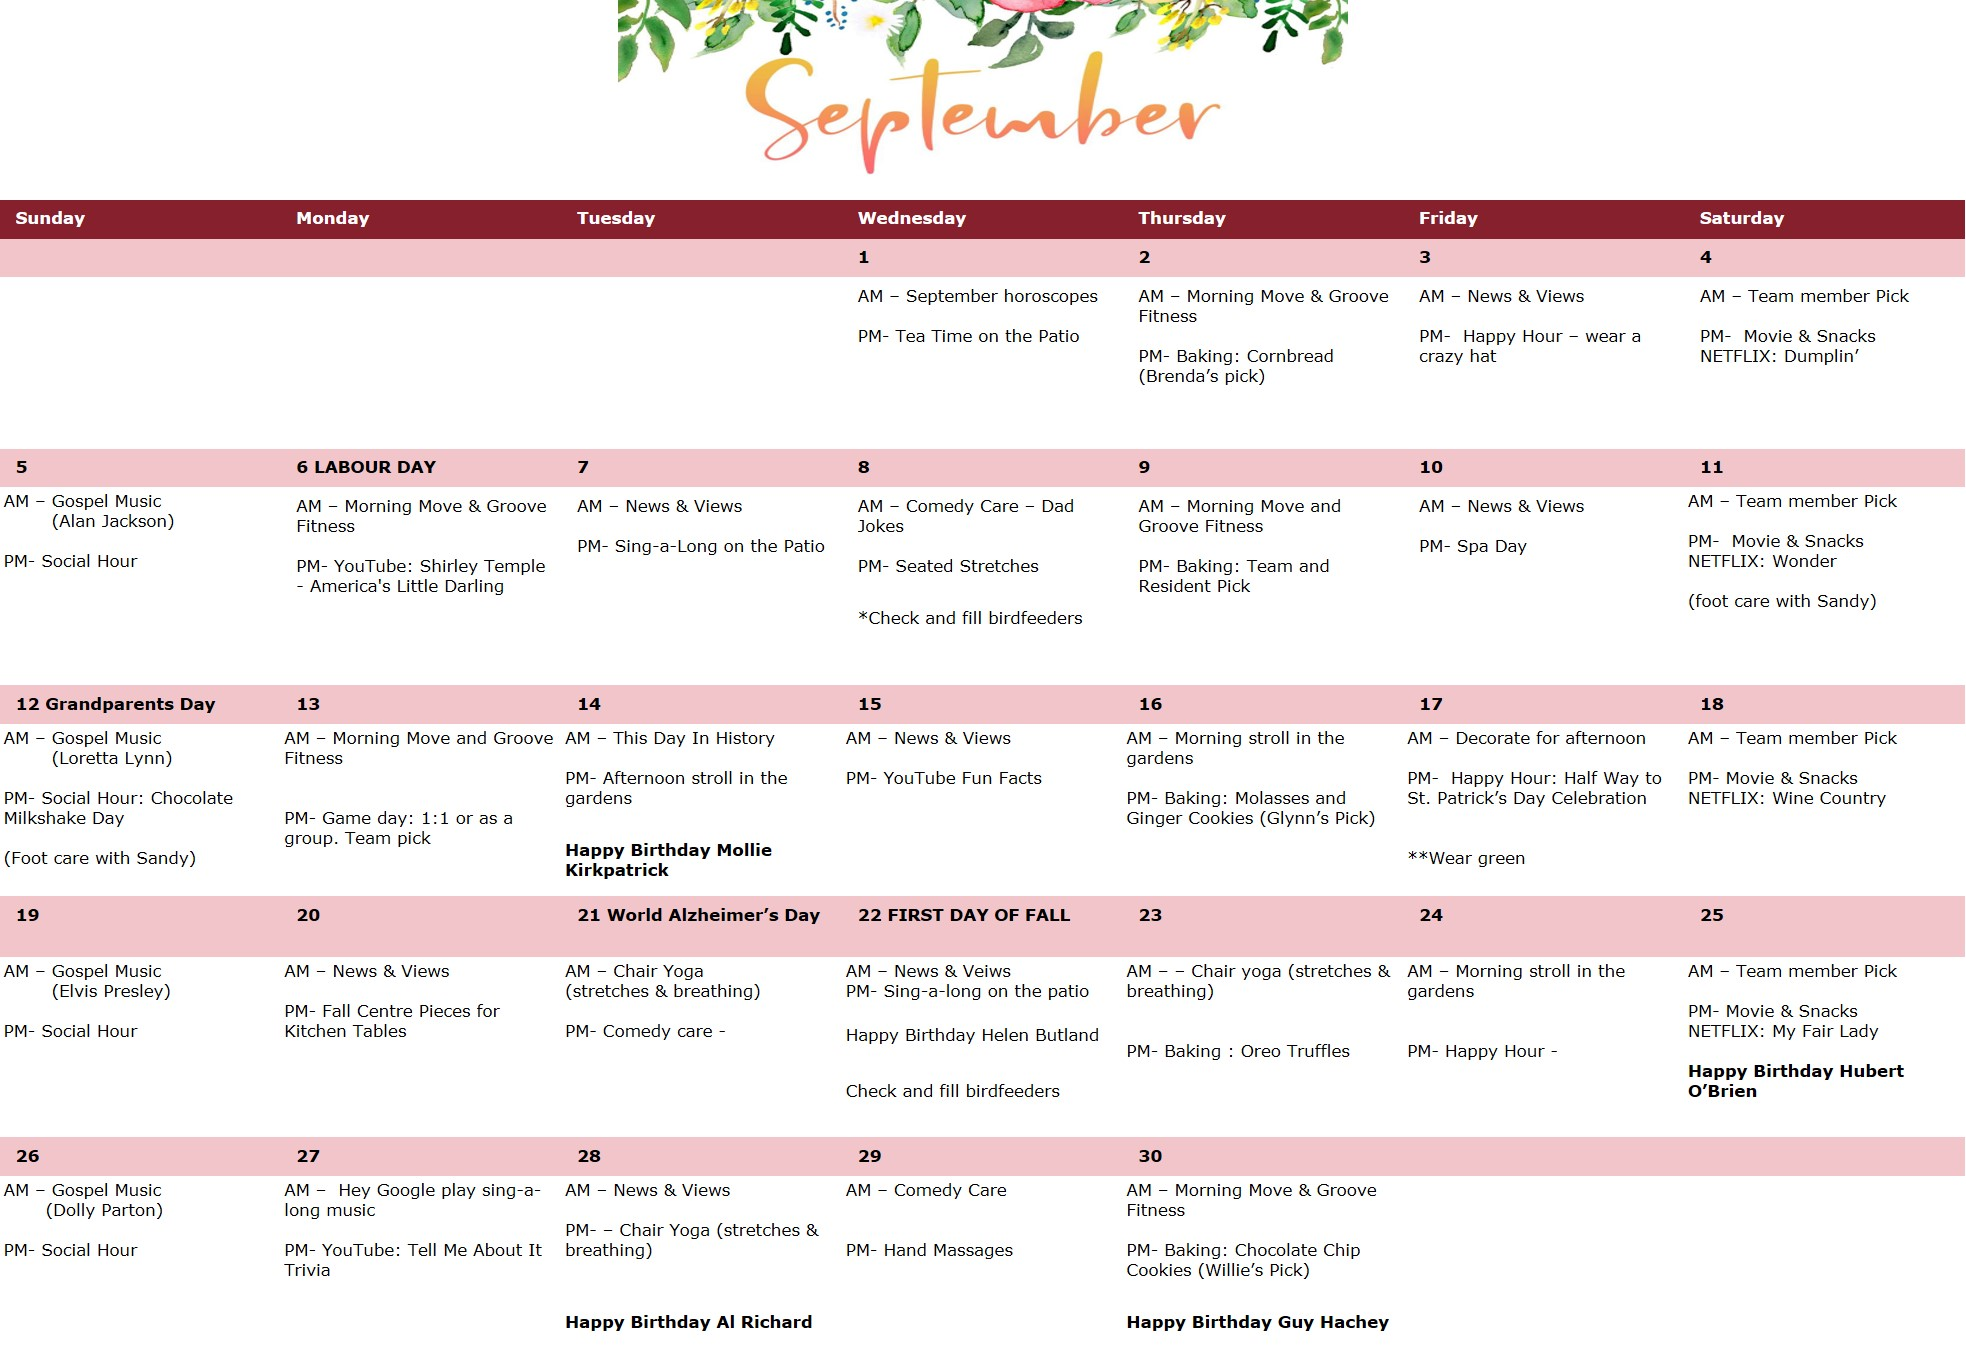 Activity Calendar for ProTem in September, 2021